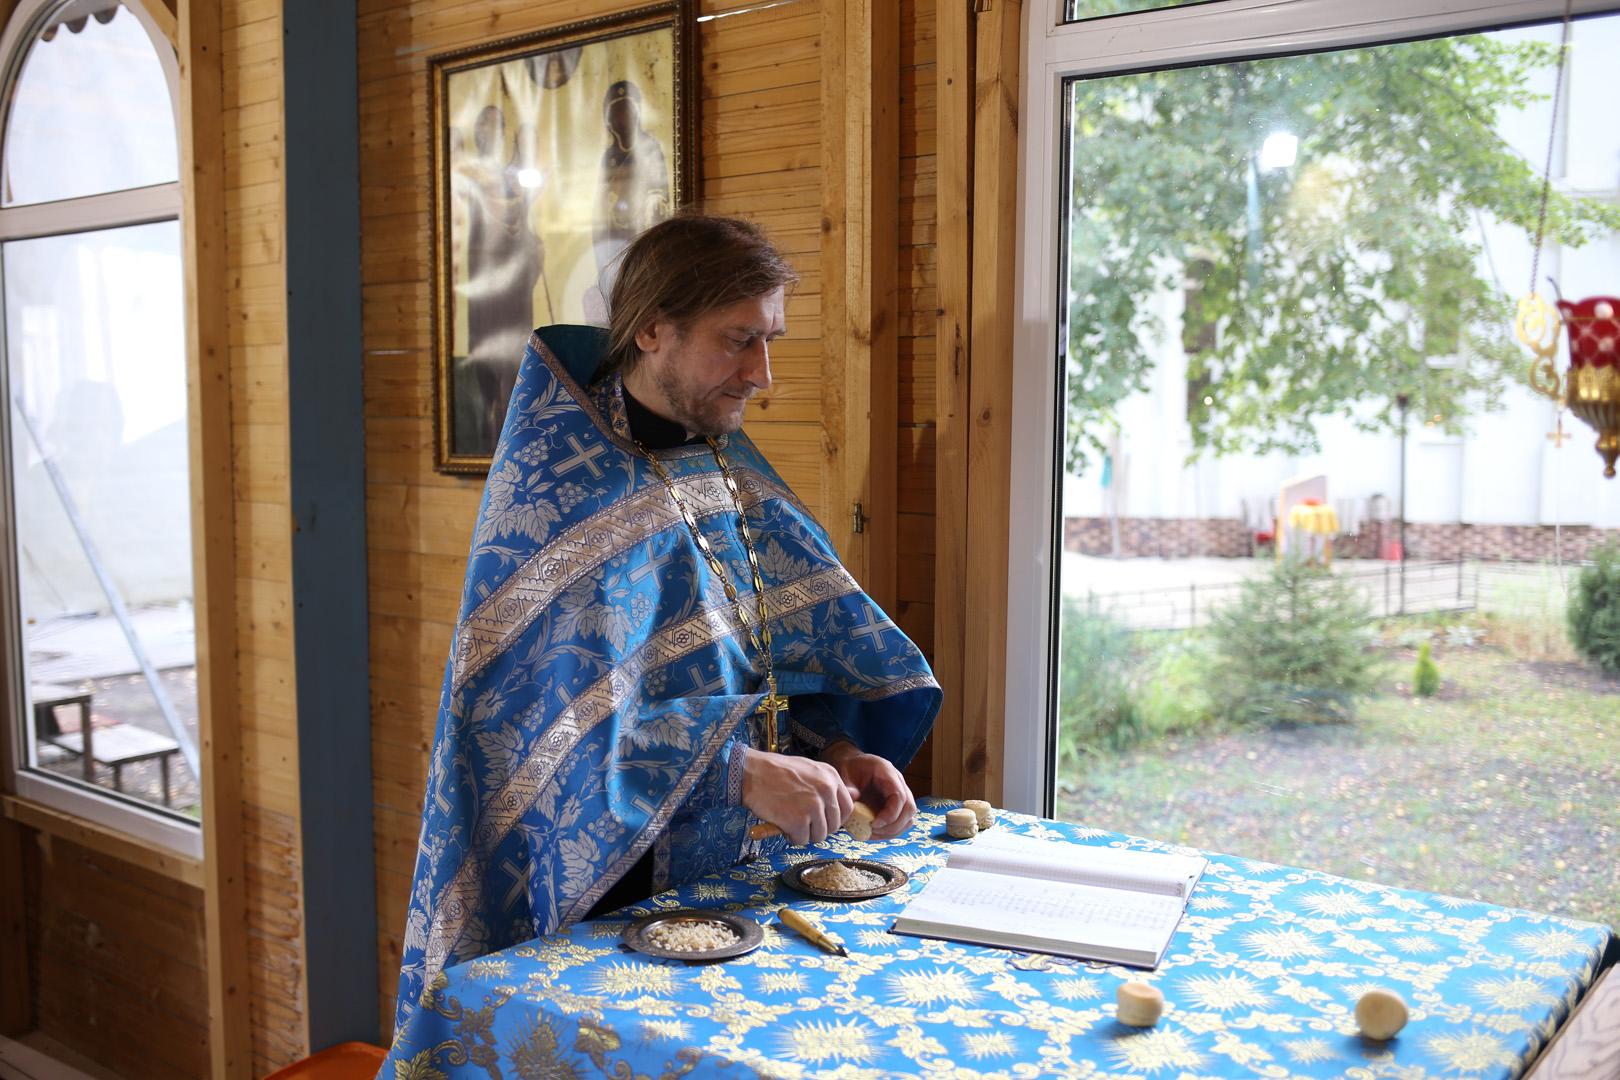 http://monuspen.ru/photoreports/c921fa66433a9104090f5865f55396ae.jpg